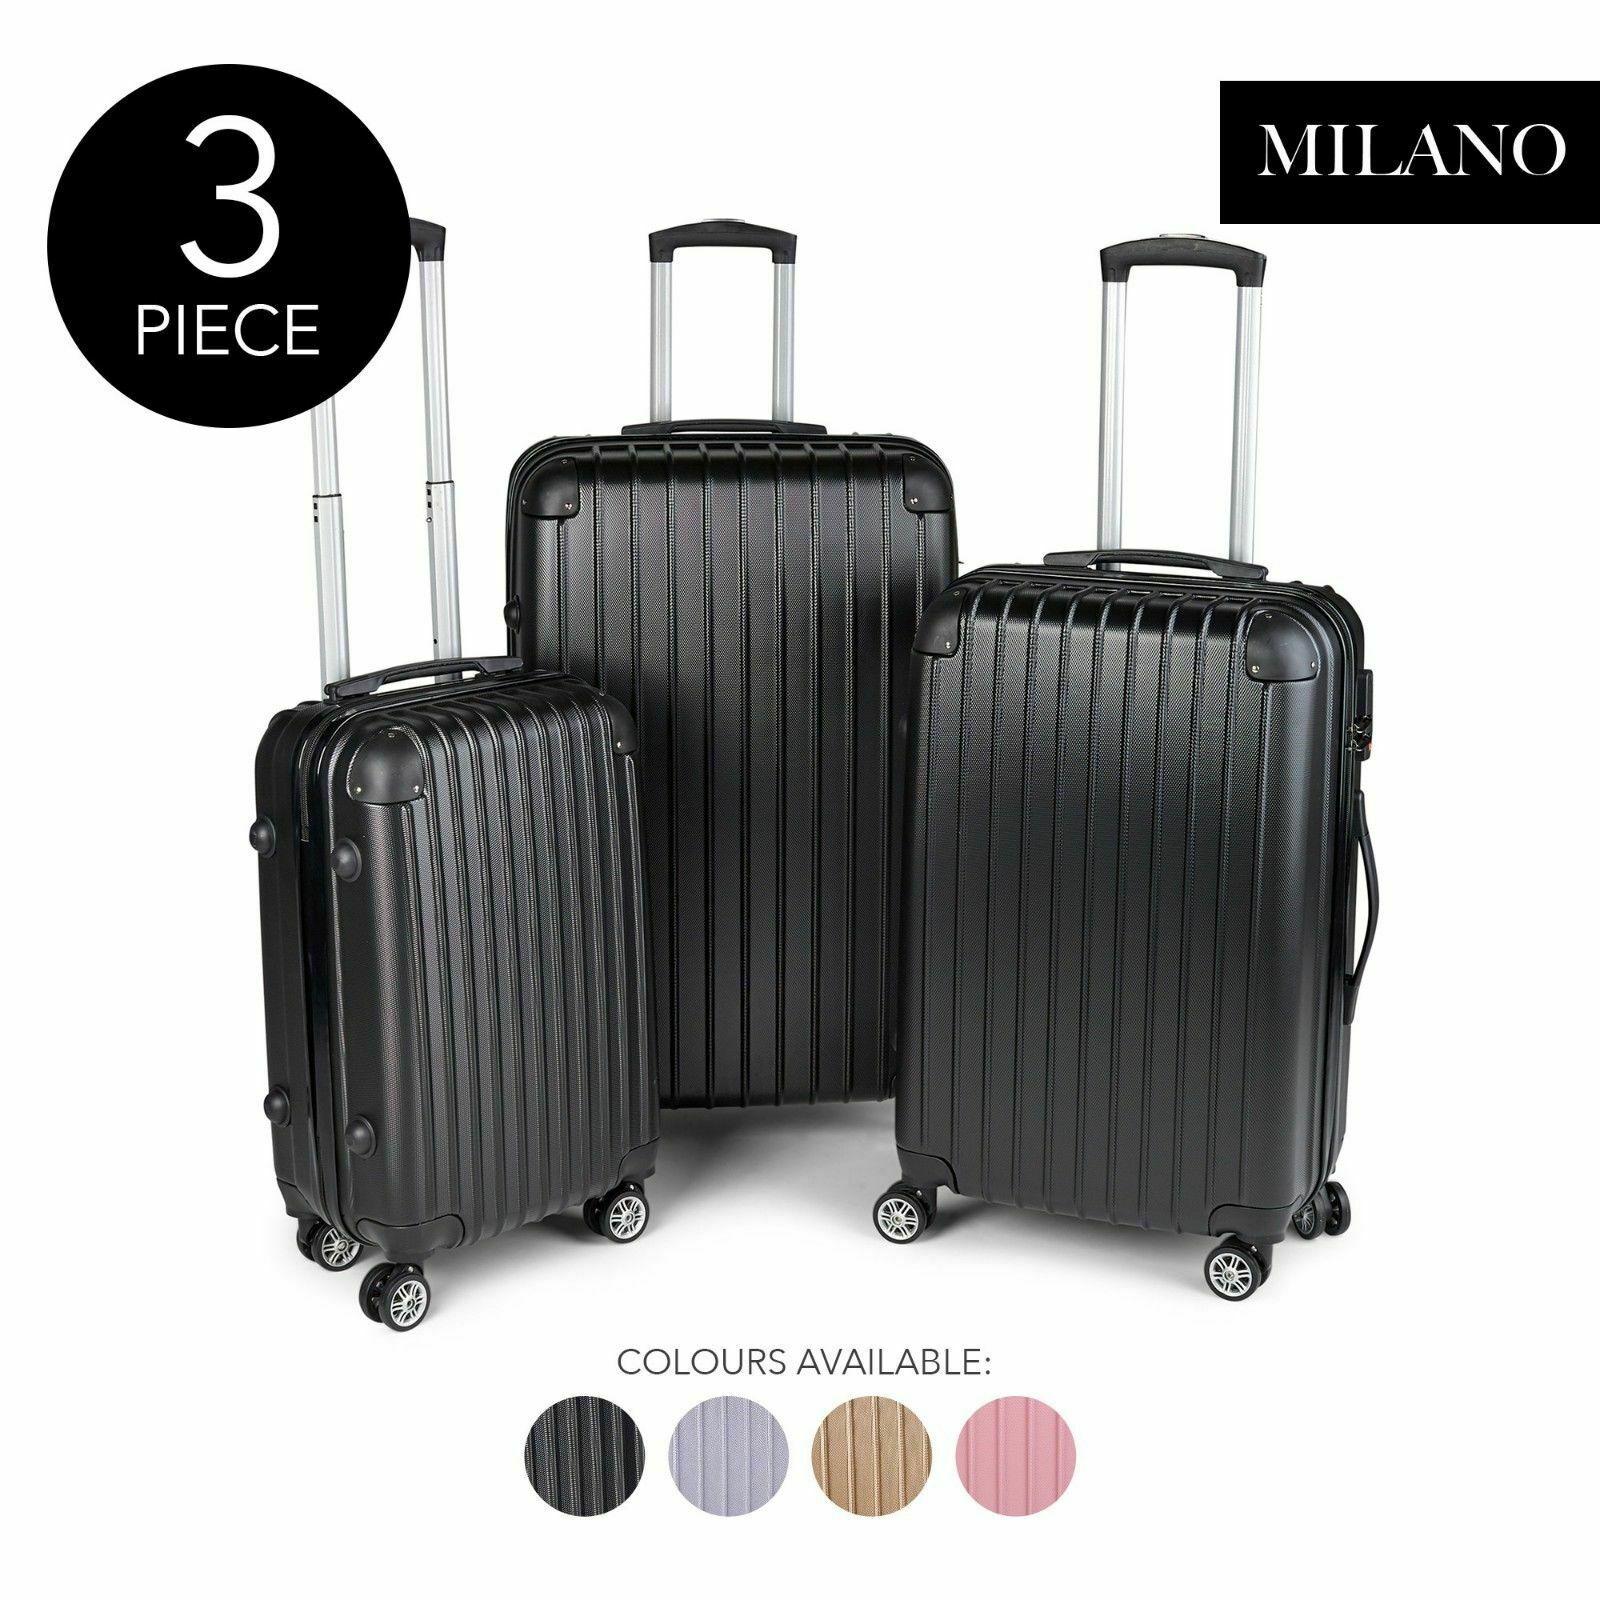 Milano 3件套硬壳防震行李箱 多色可选